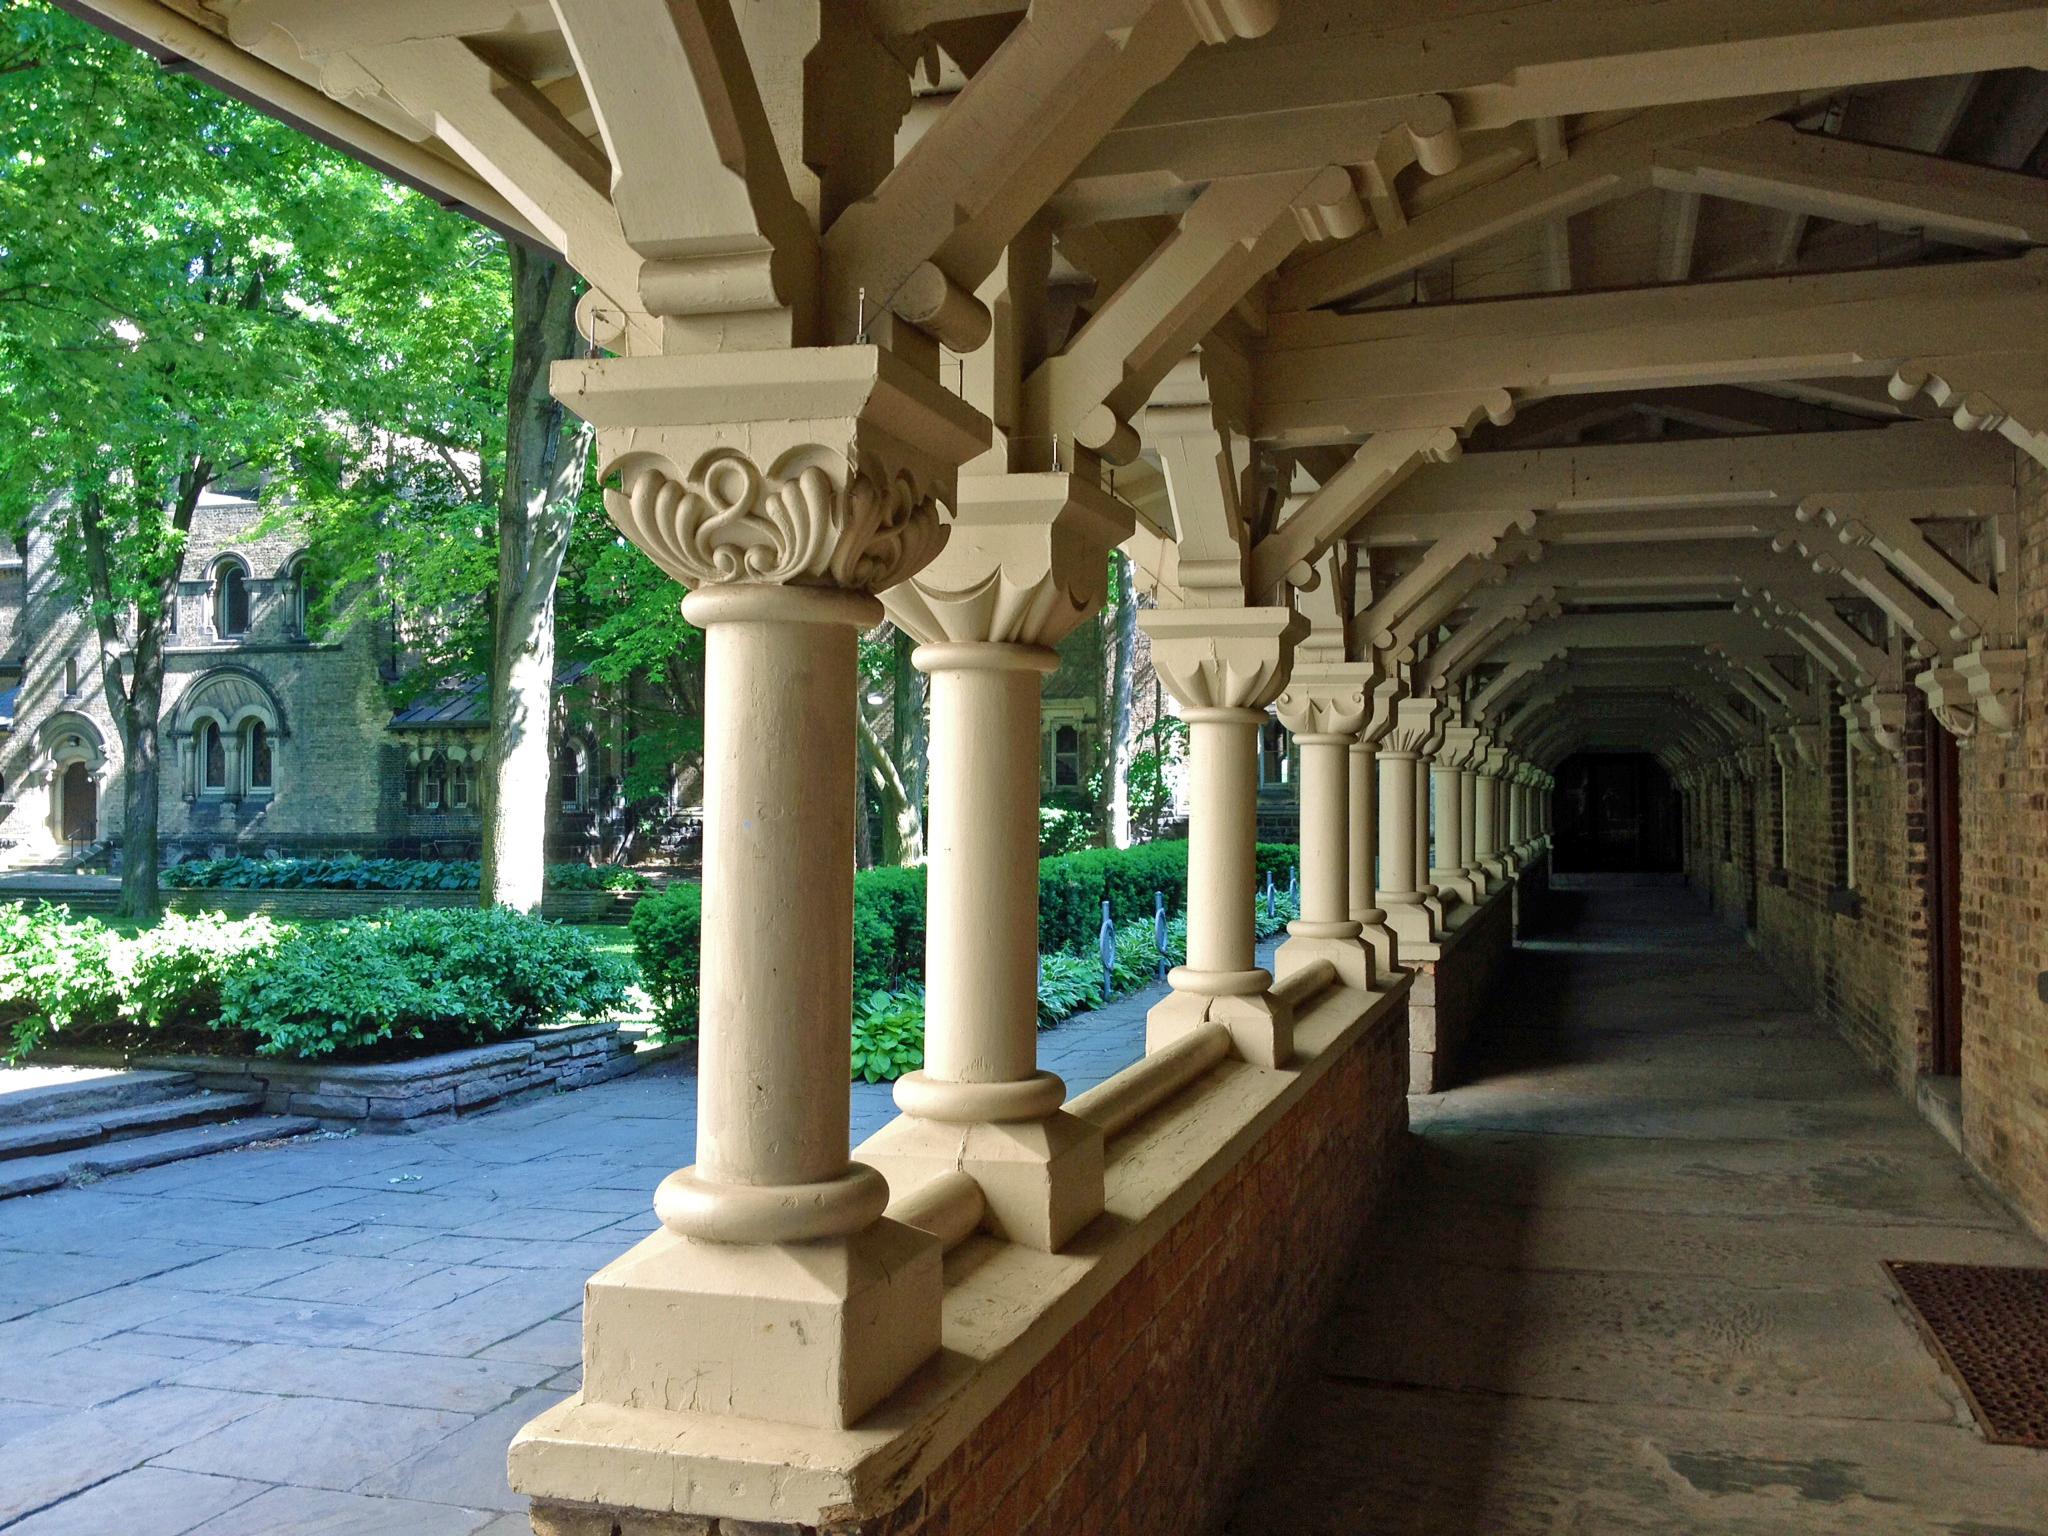 UniversityCollege-WestCollonade